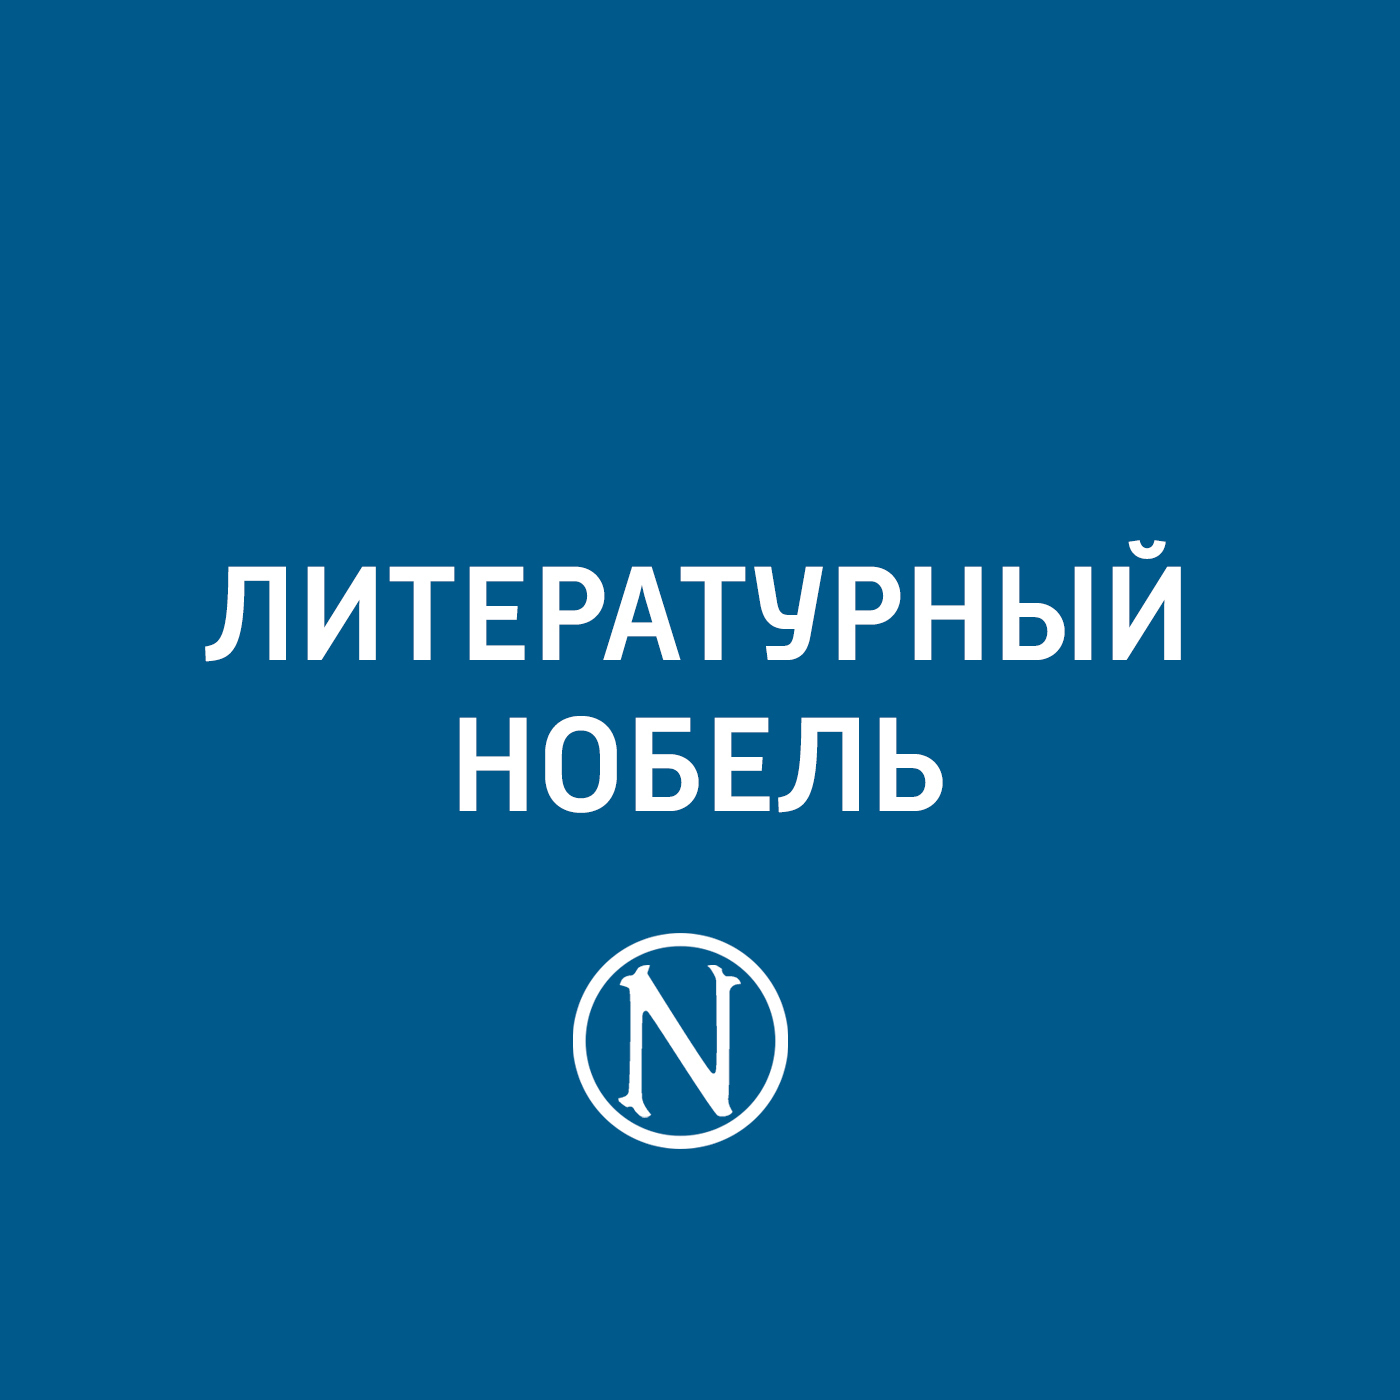 Егенй Стахоскй Лудж Пранделло